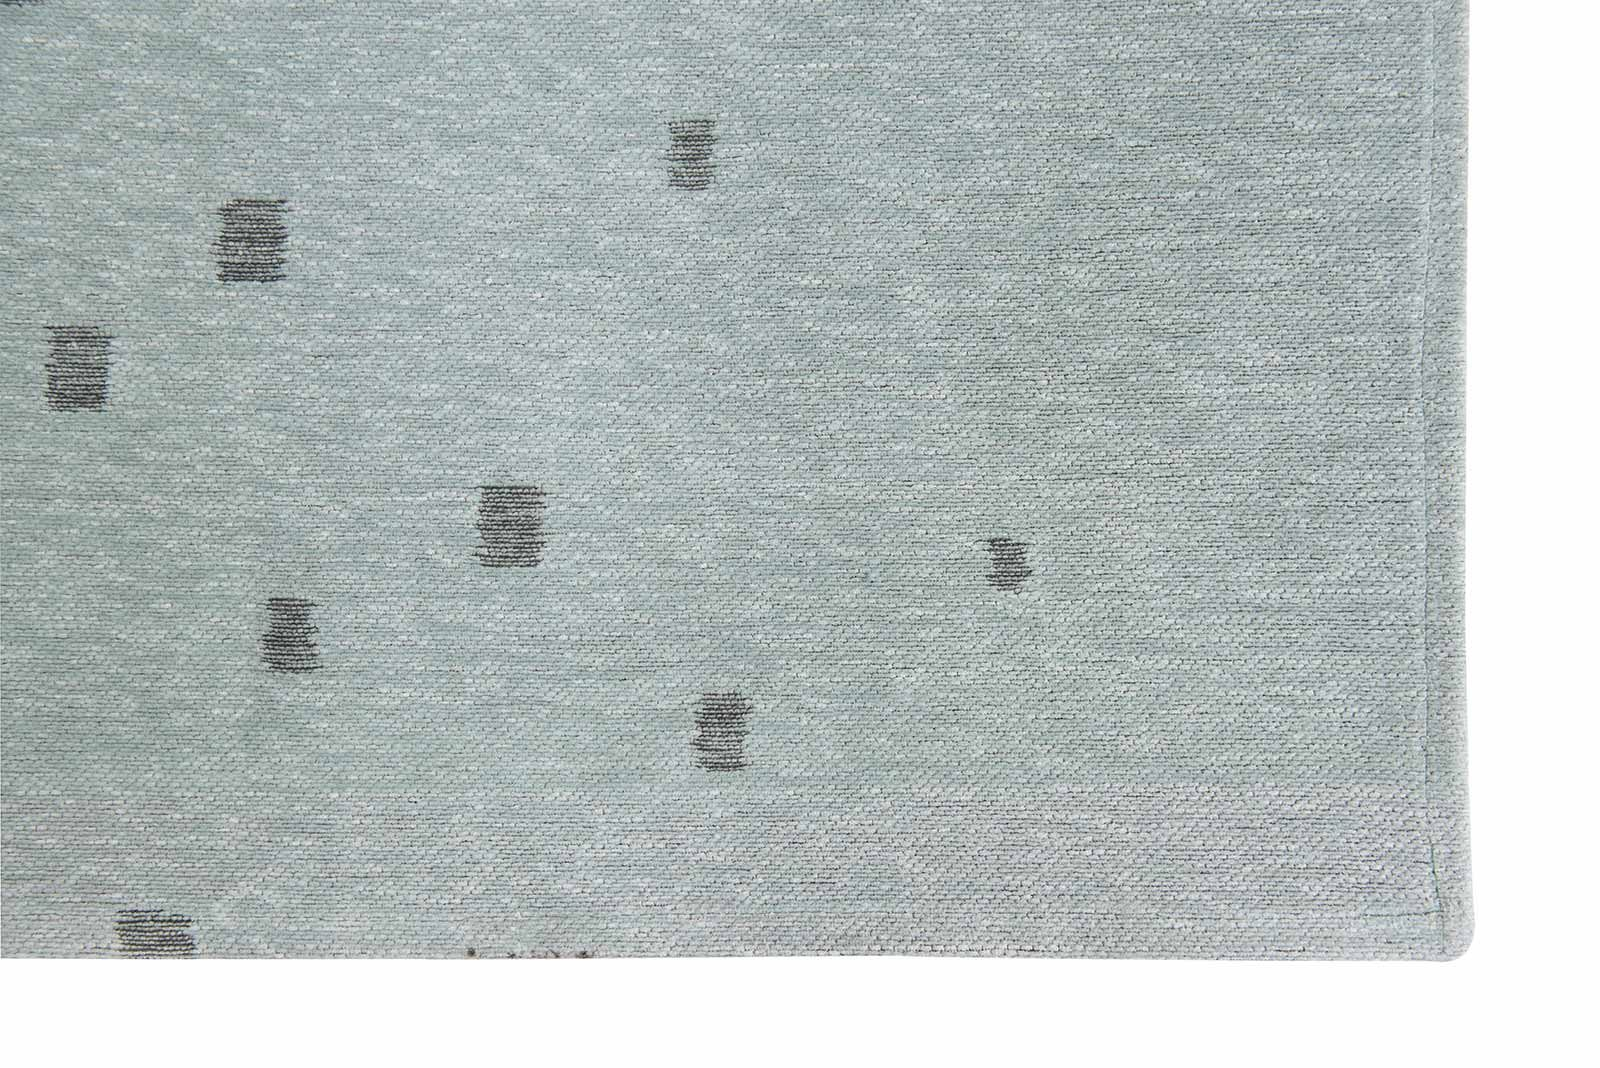 Louis De Poortere alfombras Villa Nova LX 8778 Freyr Verdigris corner